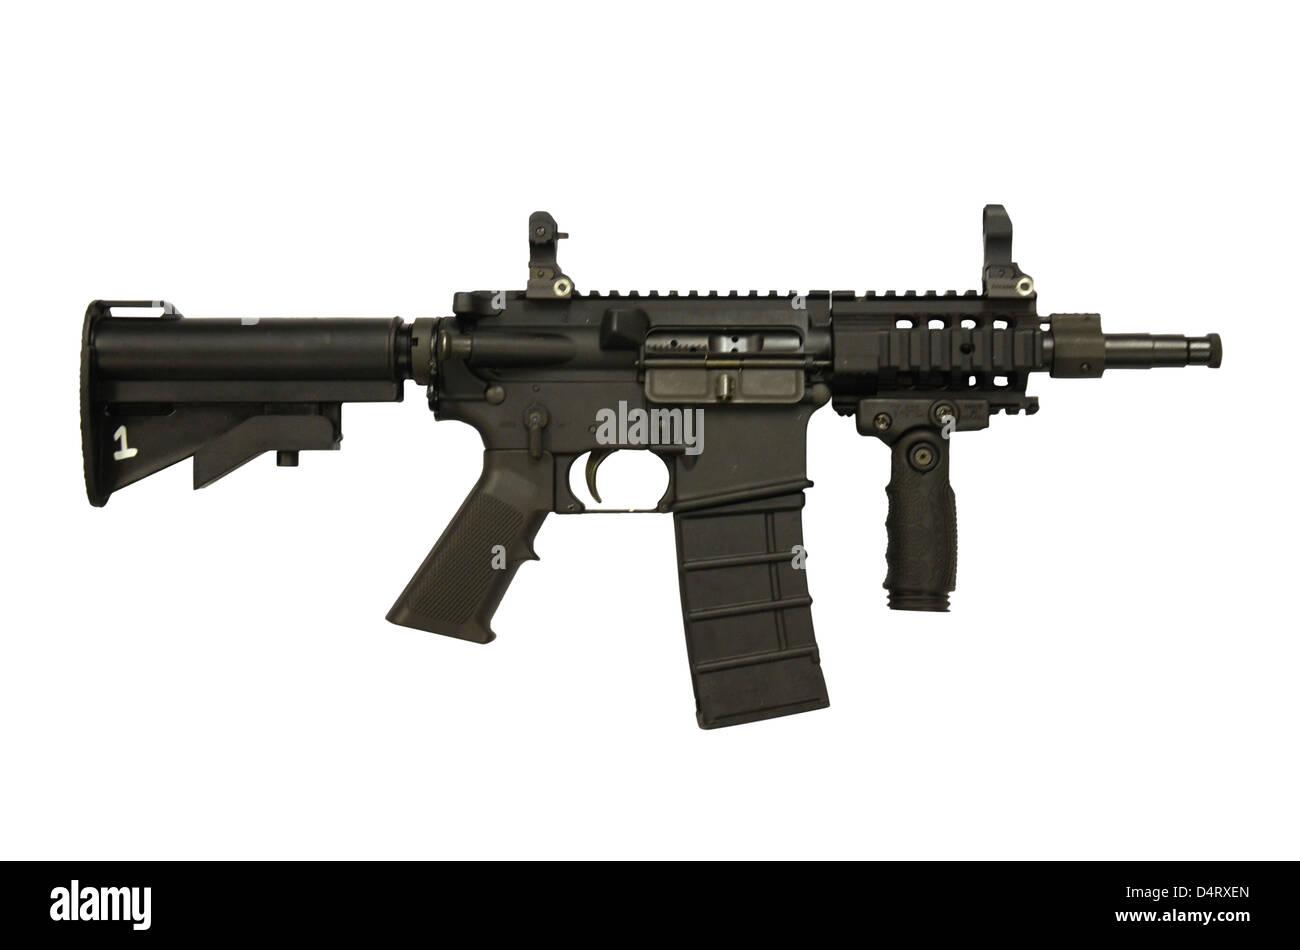 M4 Carbine 5.56mm micro variant. - Stock Image